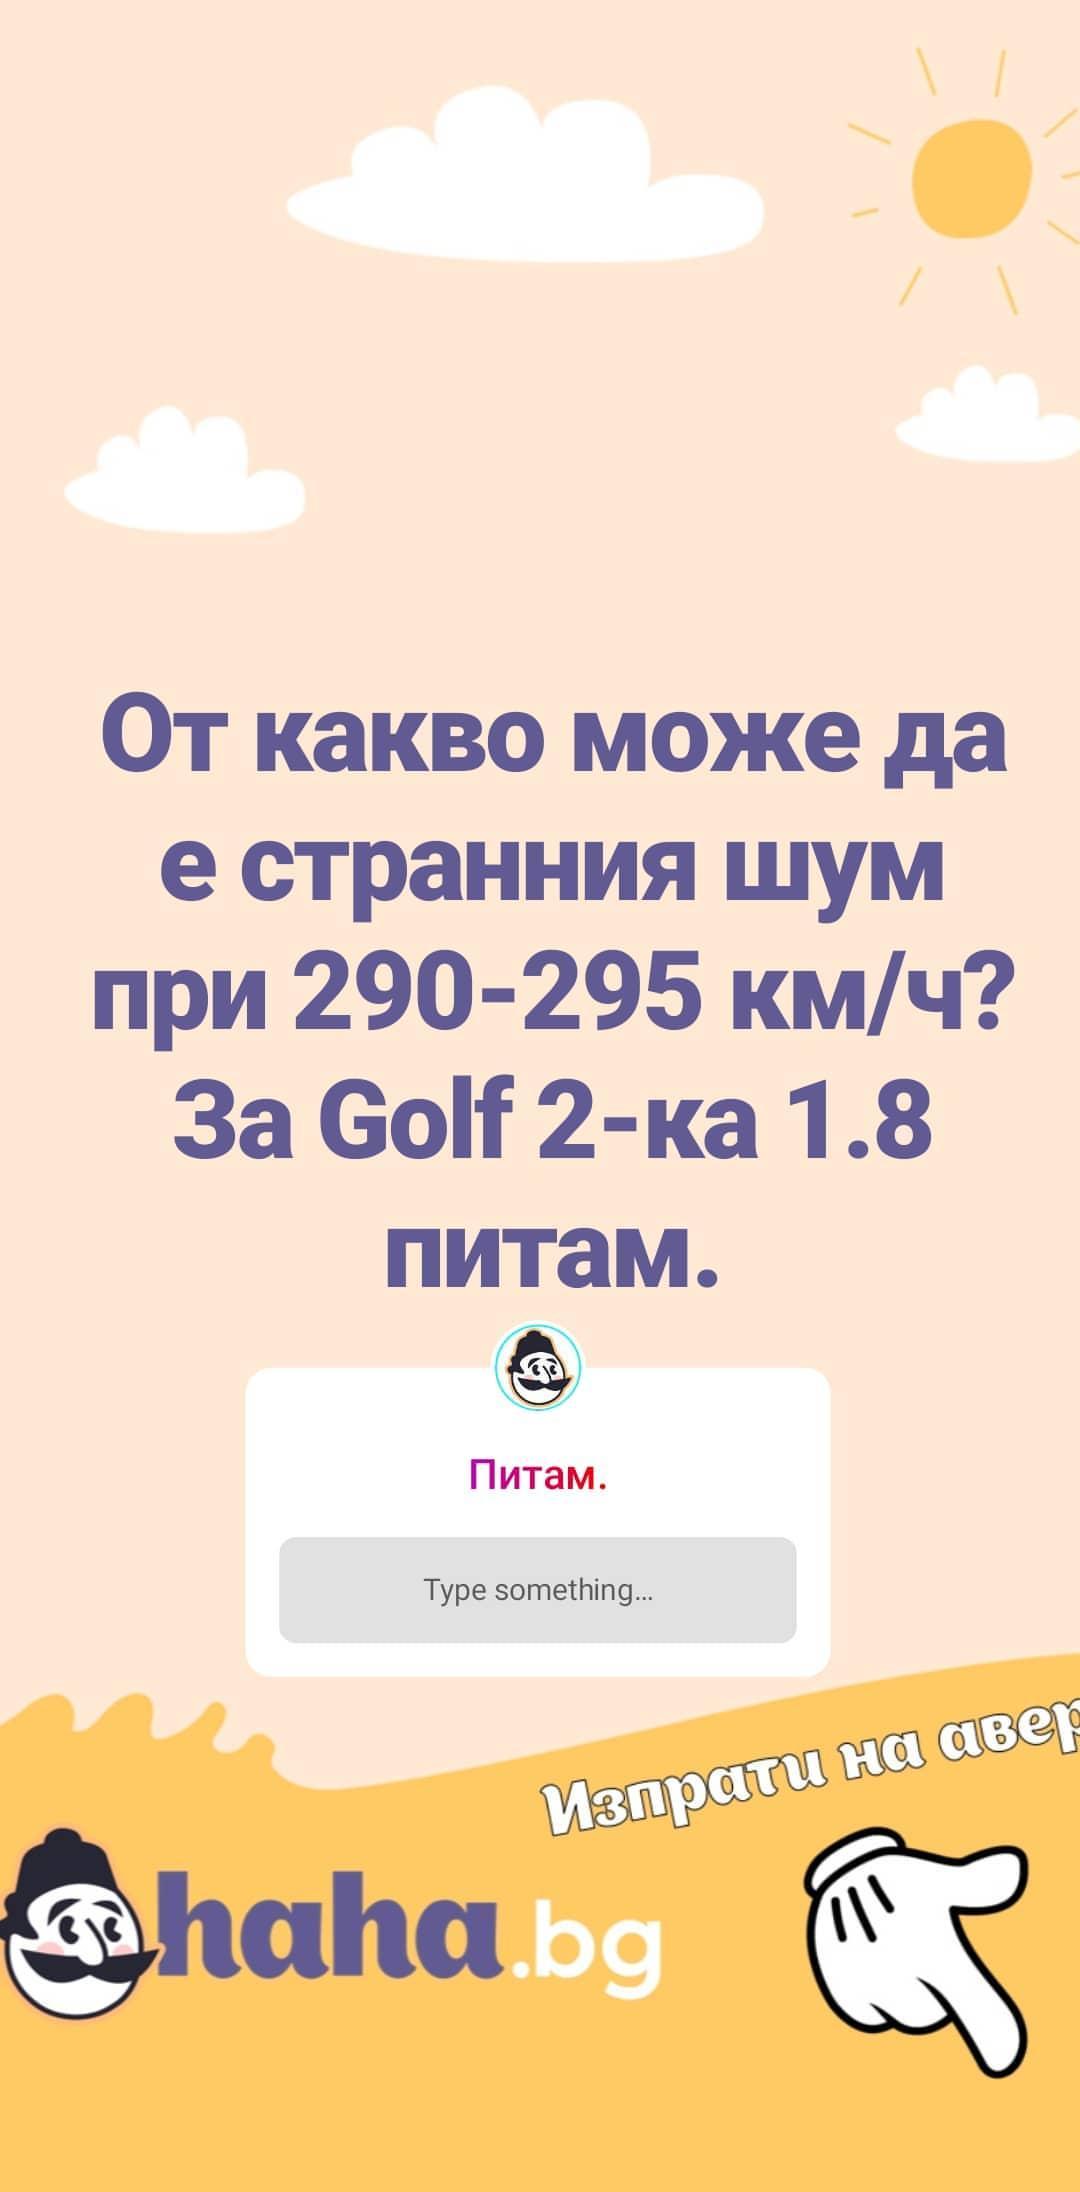 Голф 2 шум при 290 км/ч